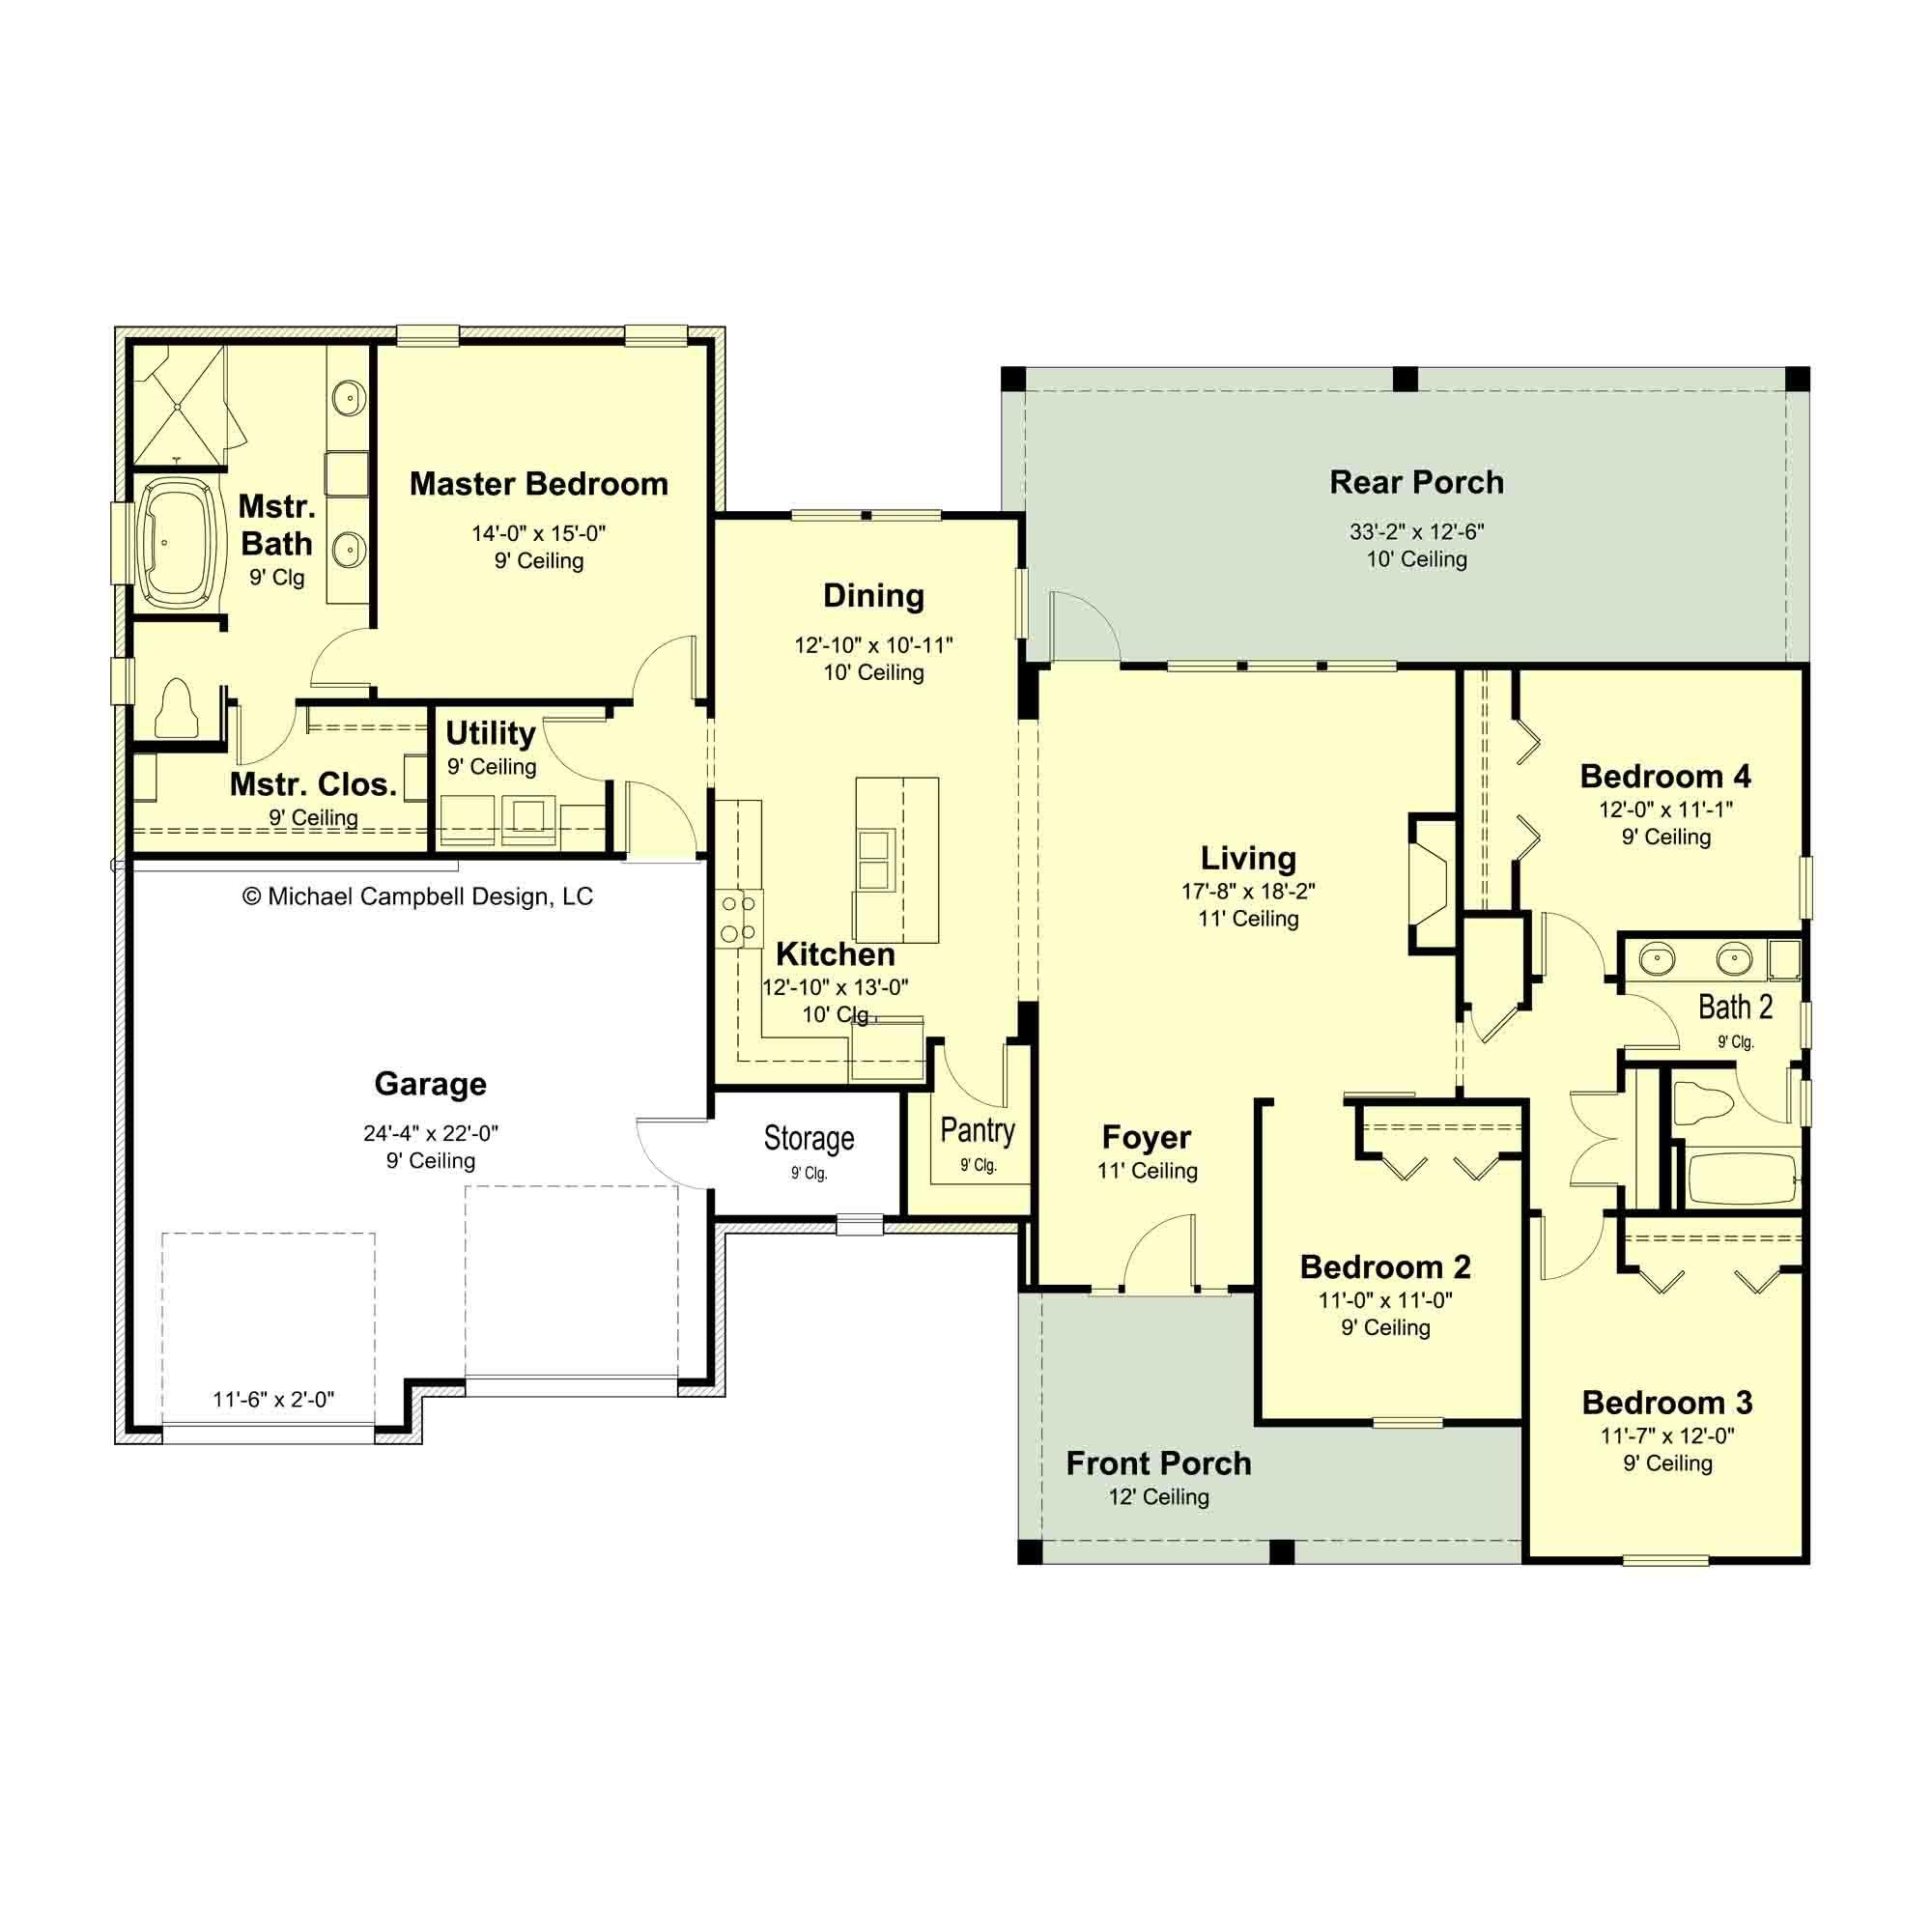 House Plans2 000 Sq Ft – Michael Campbell Design